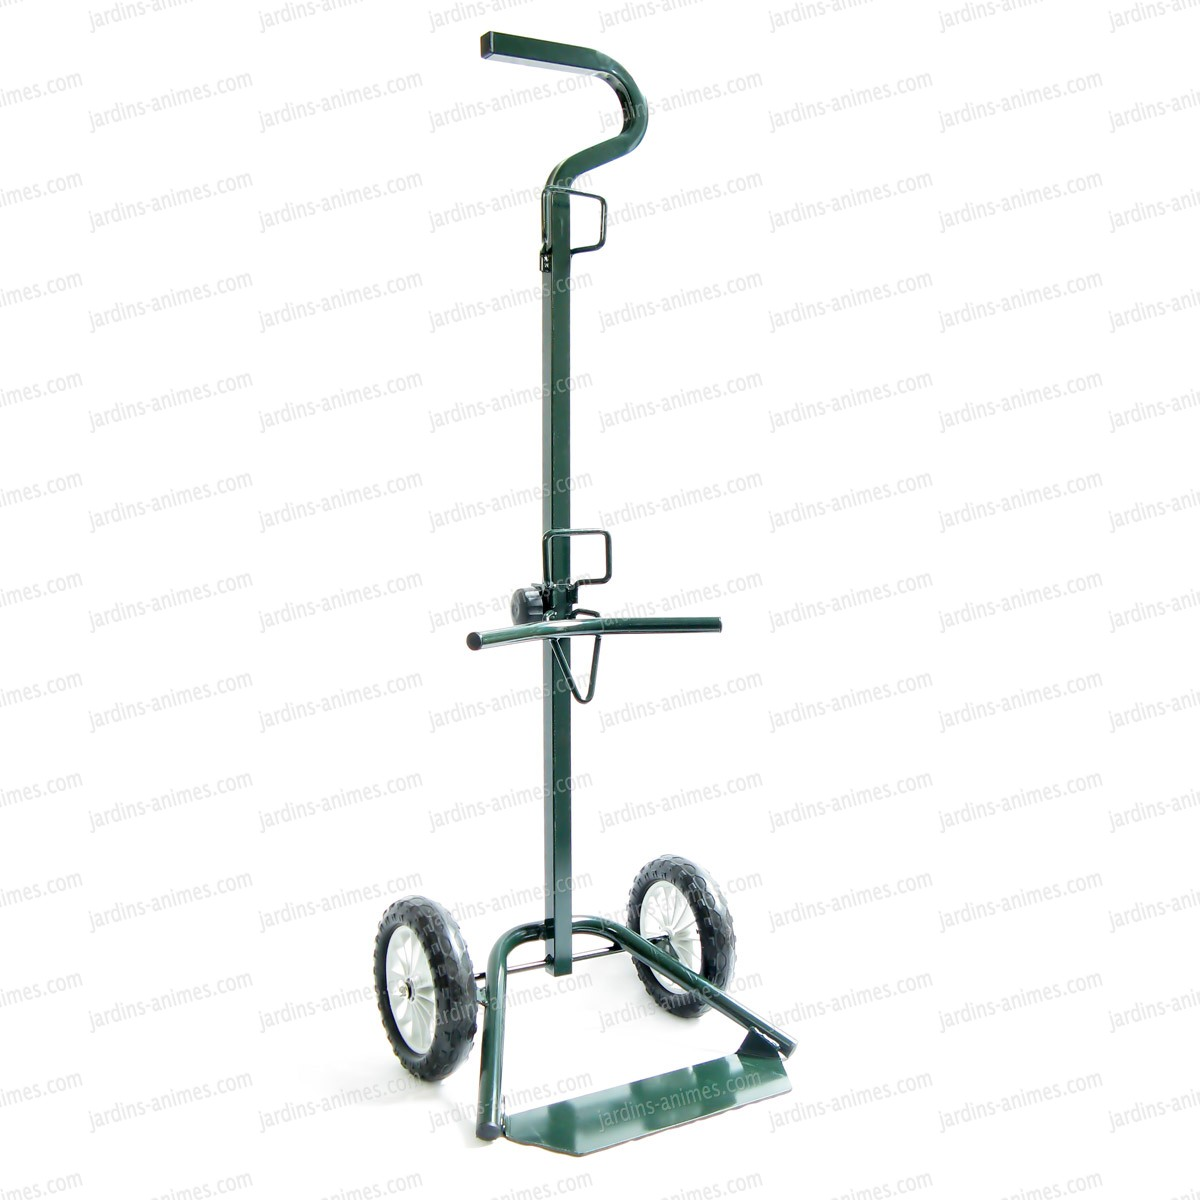 diable chariot de jardin sac baquet seau chariot. Black Bedroom Furniture Sets. Home Design Ideas